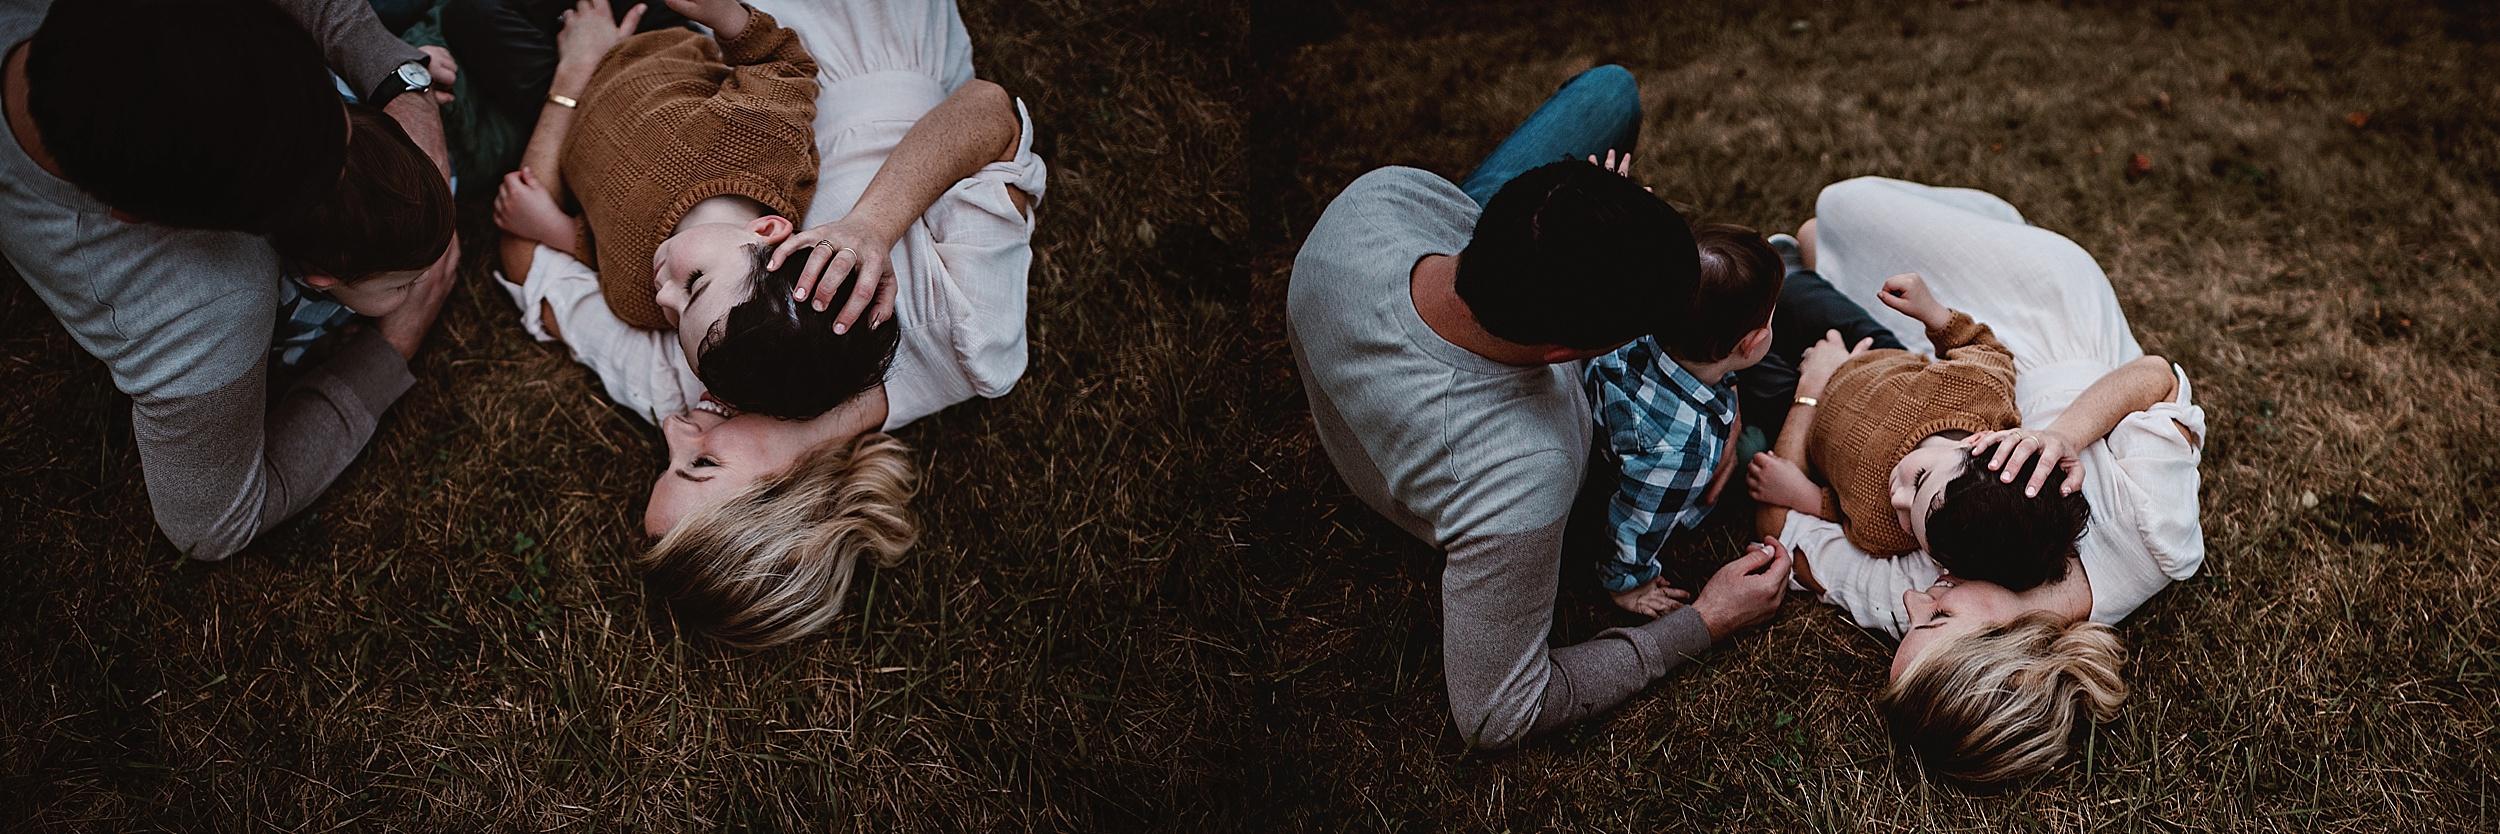 lauren-grayson-photography-portrait-artist-akron-cleveland-ohio-photographer-family-session-fields-sunset-fall_0215.jpg